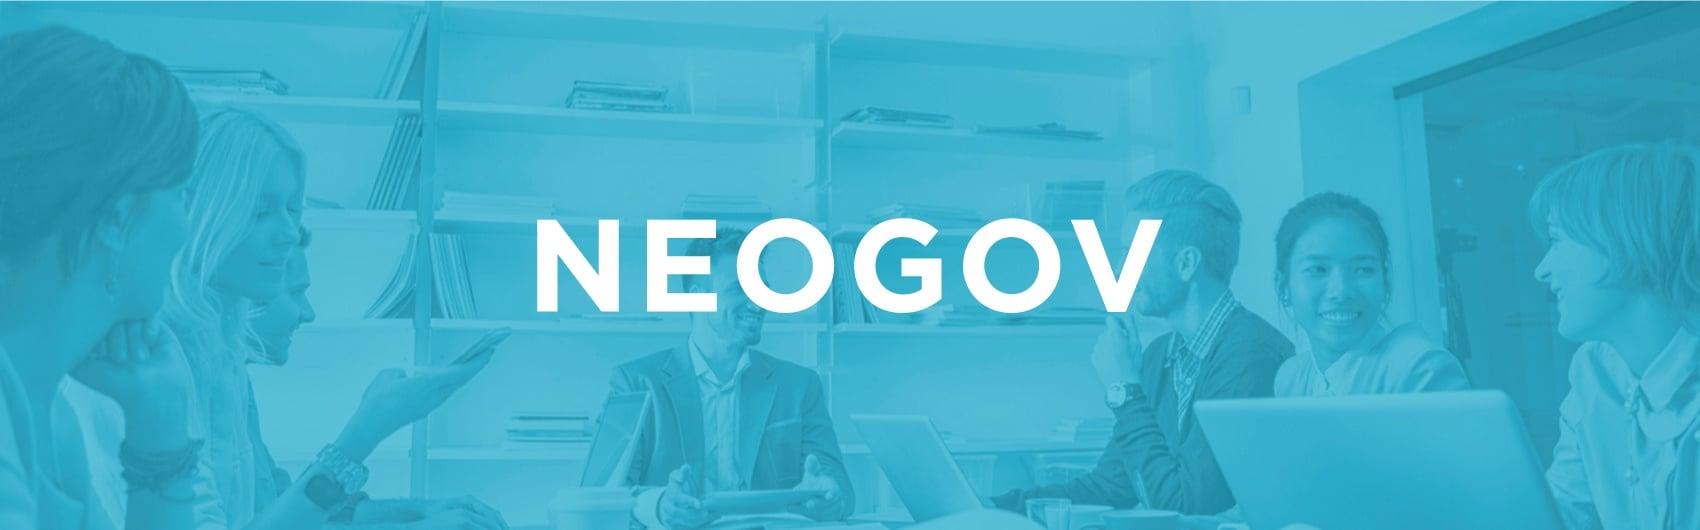 NEOGOV Honored with Multiple Awards